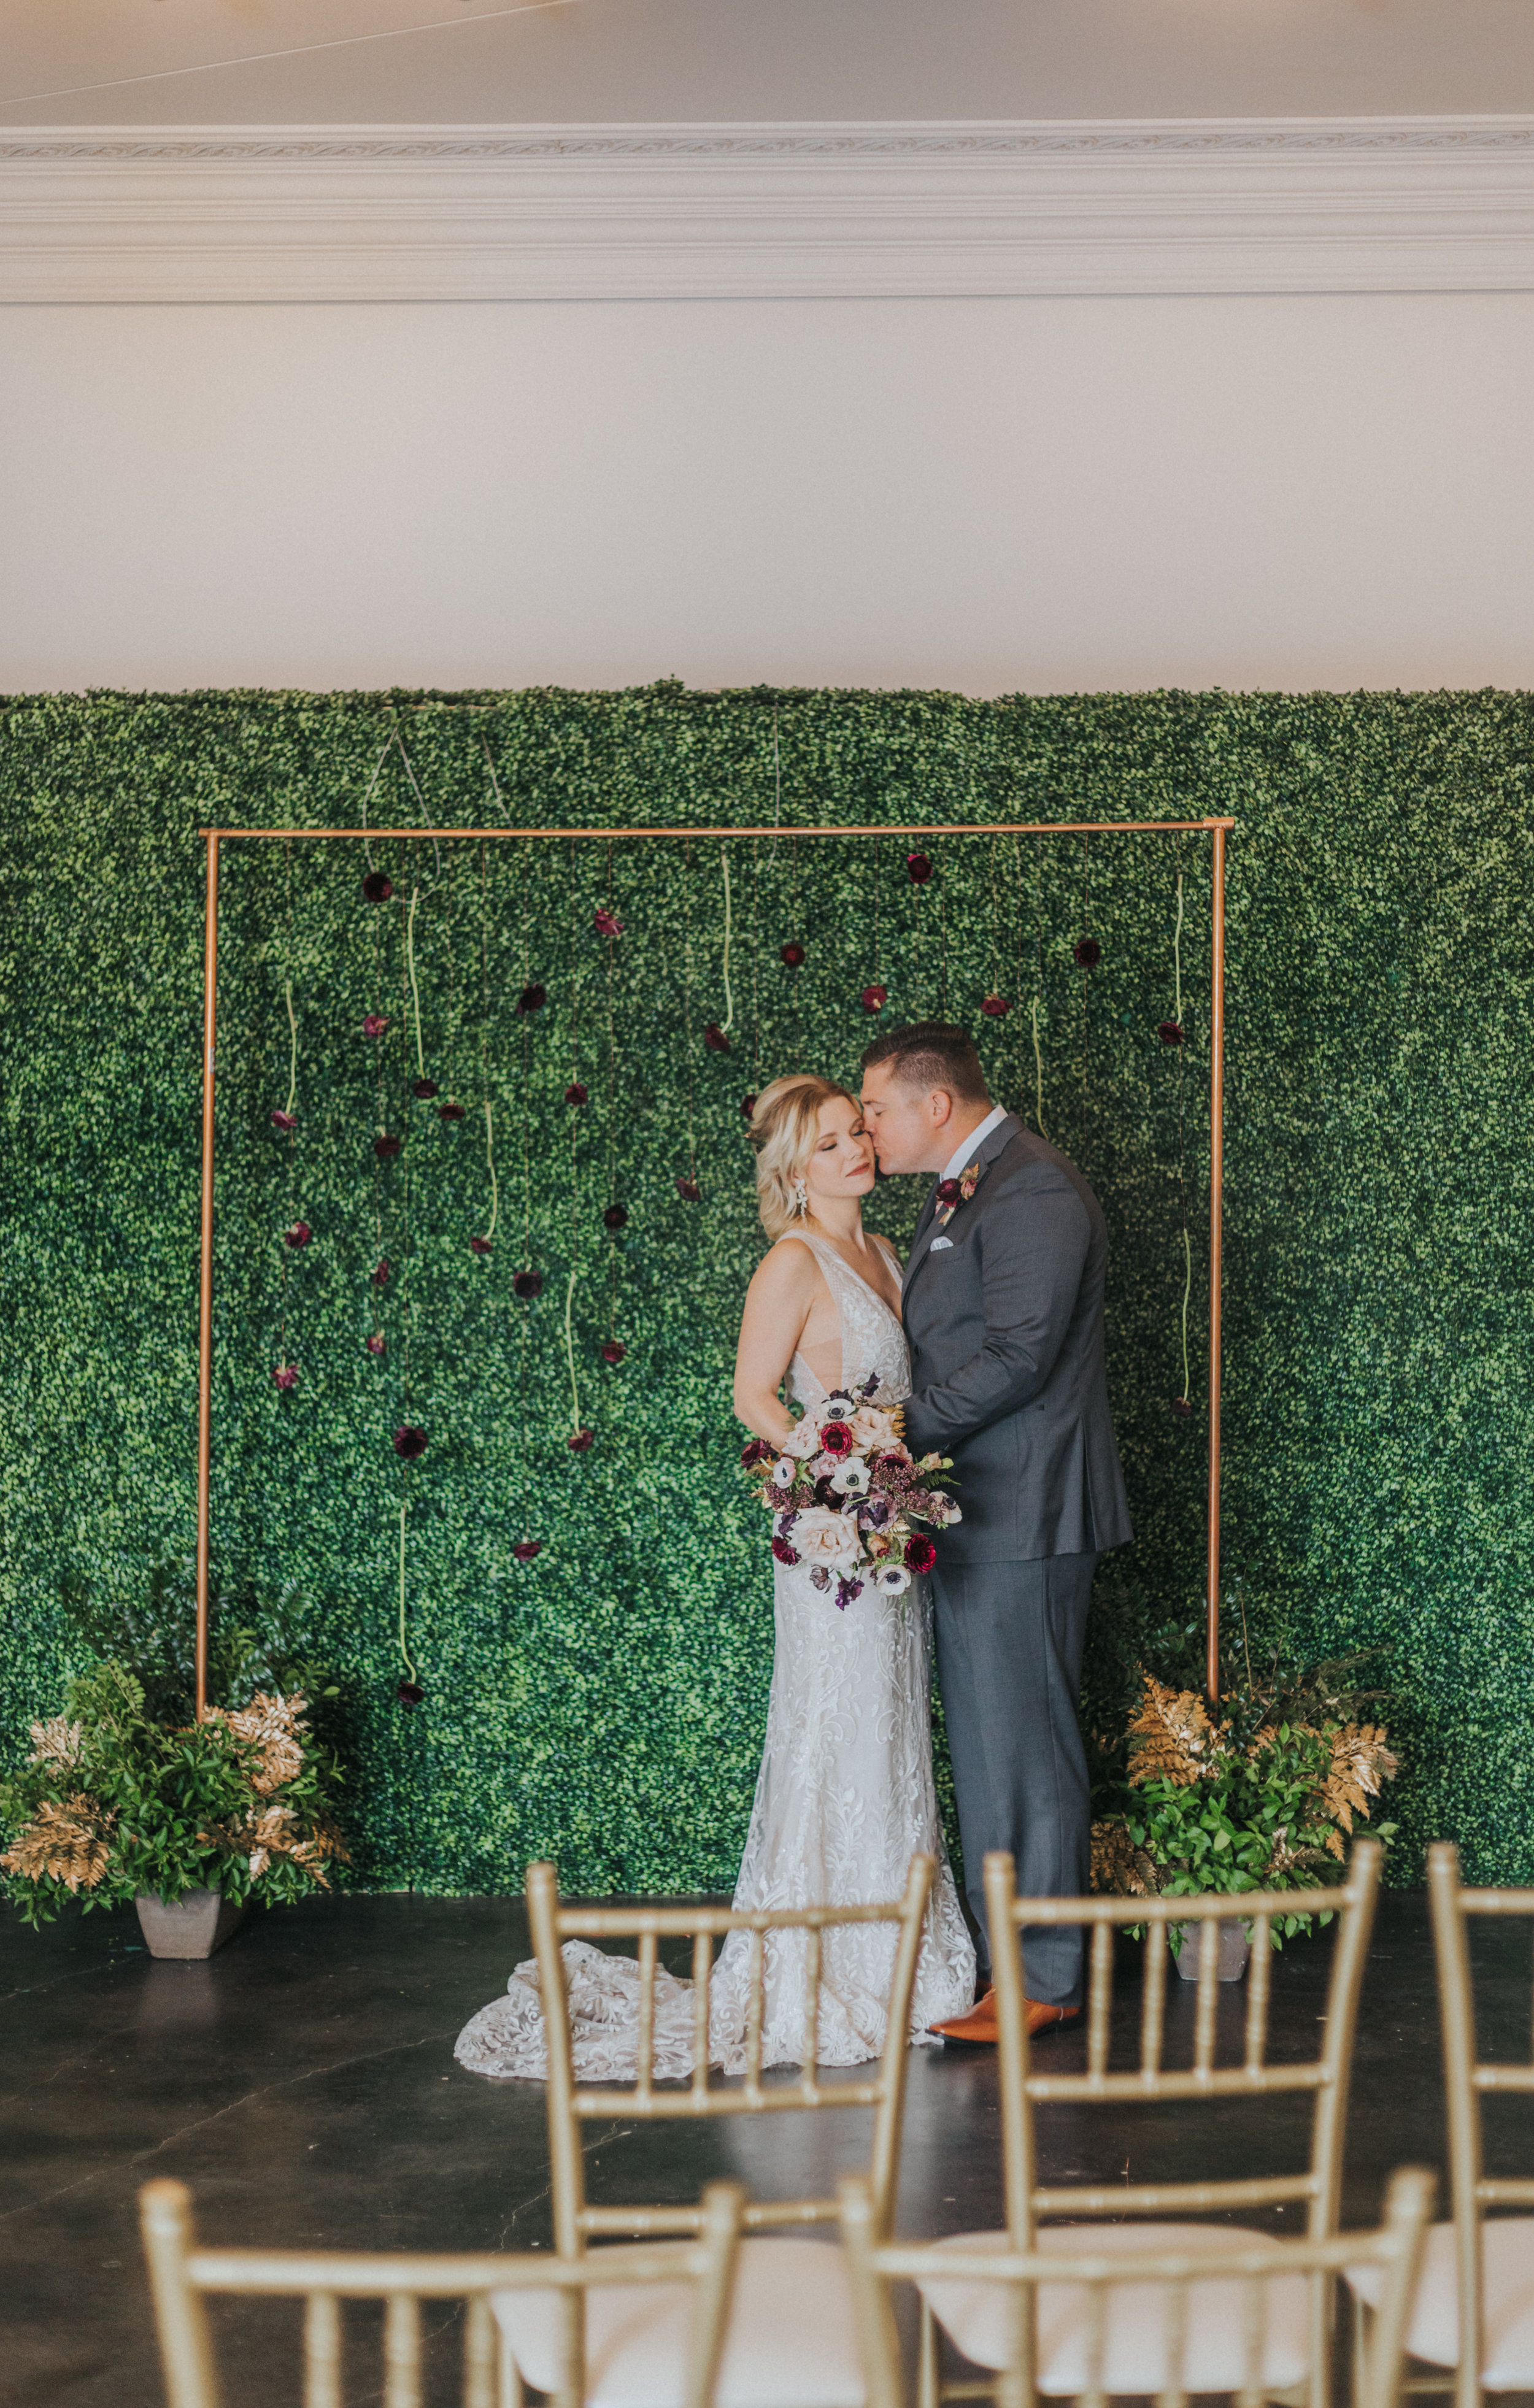 118 tiny-luxe-weddings-omaha-nebraska-midwest-empire-room.jpg